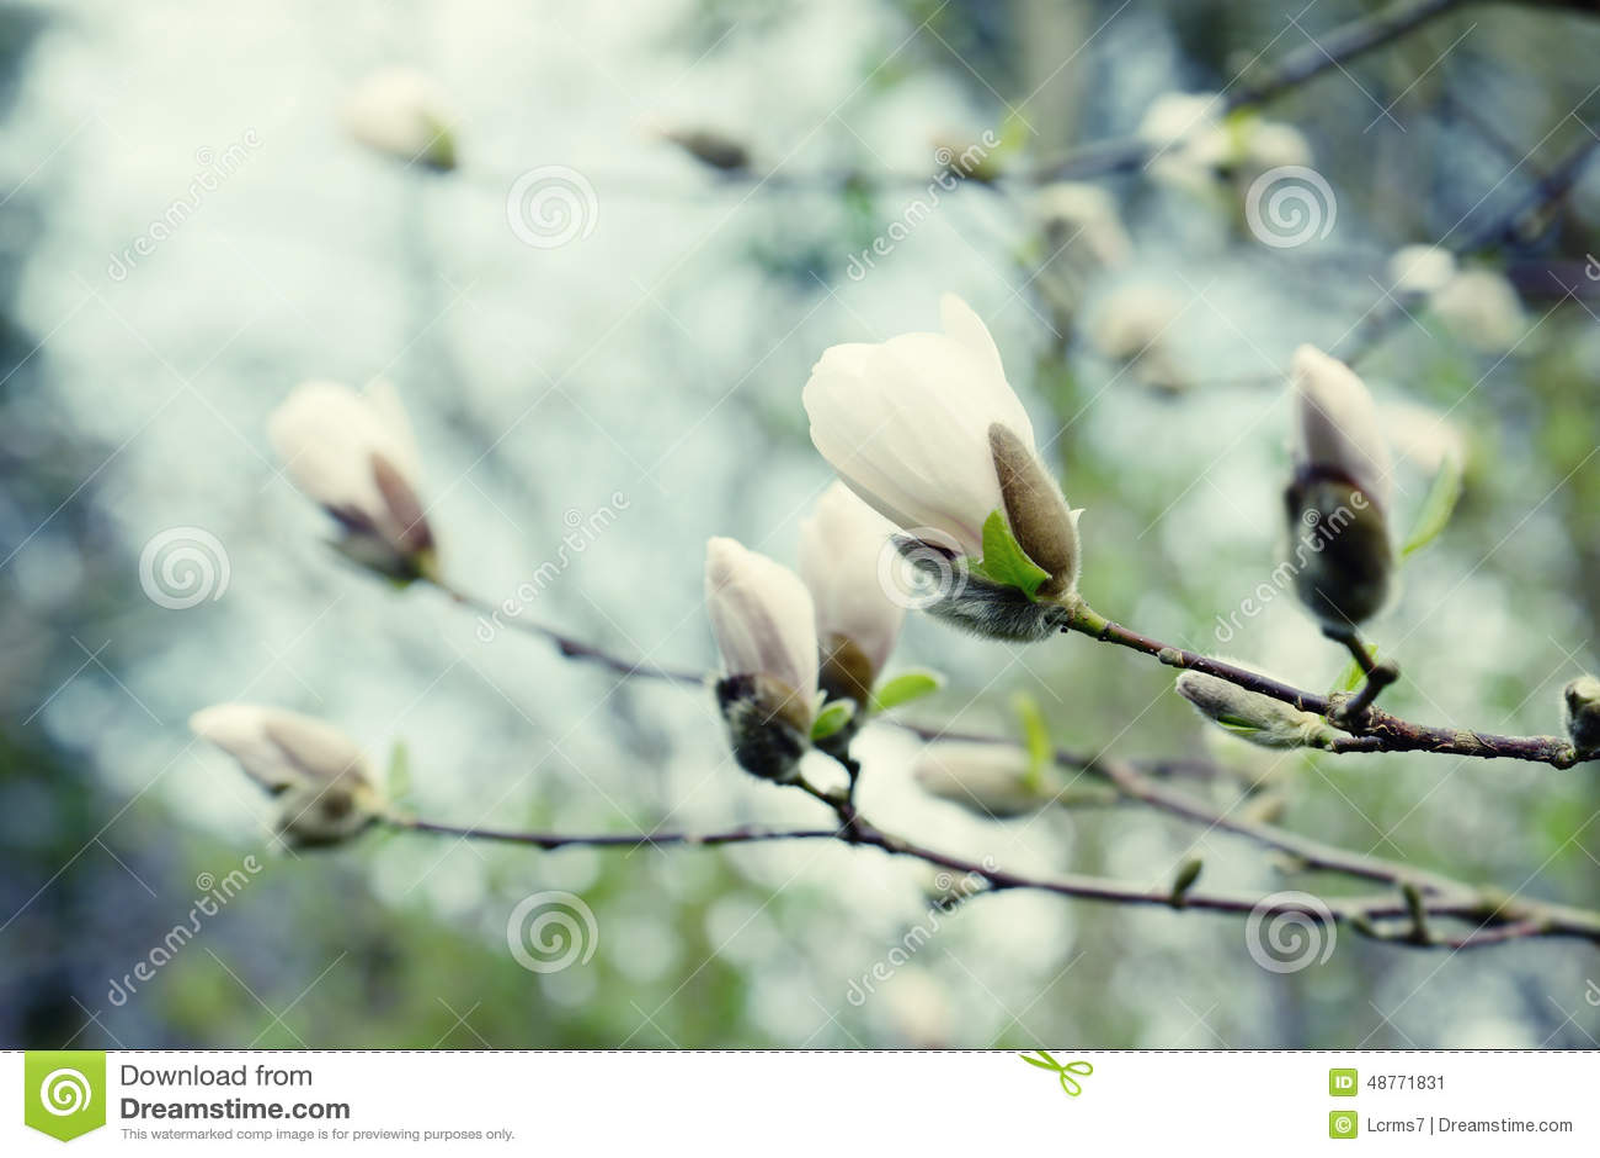 Witte knop van magnoliaboom